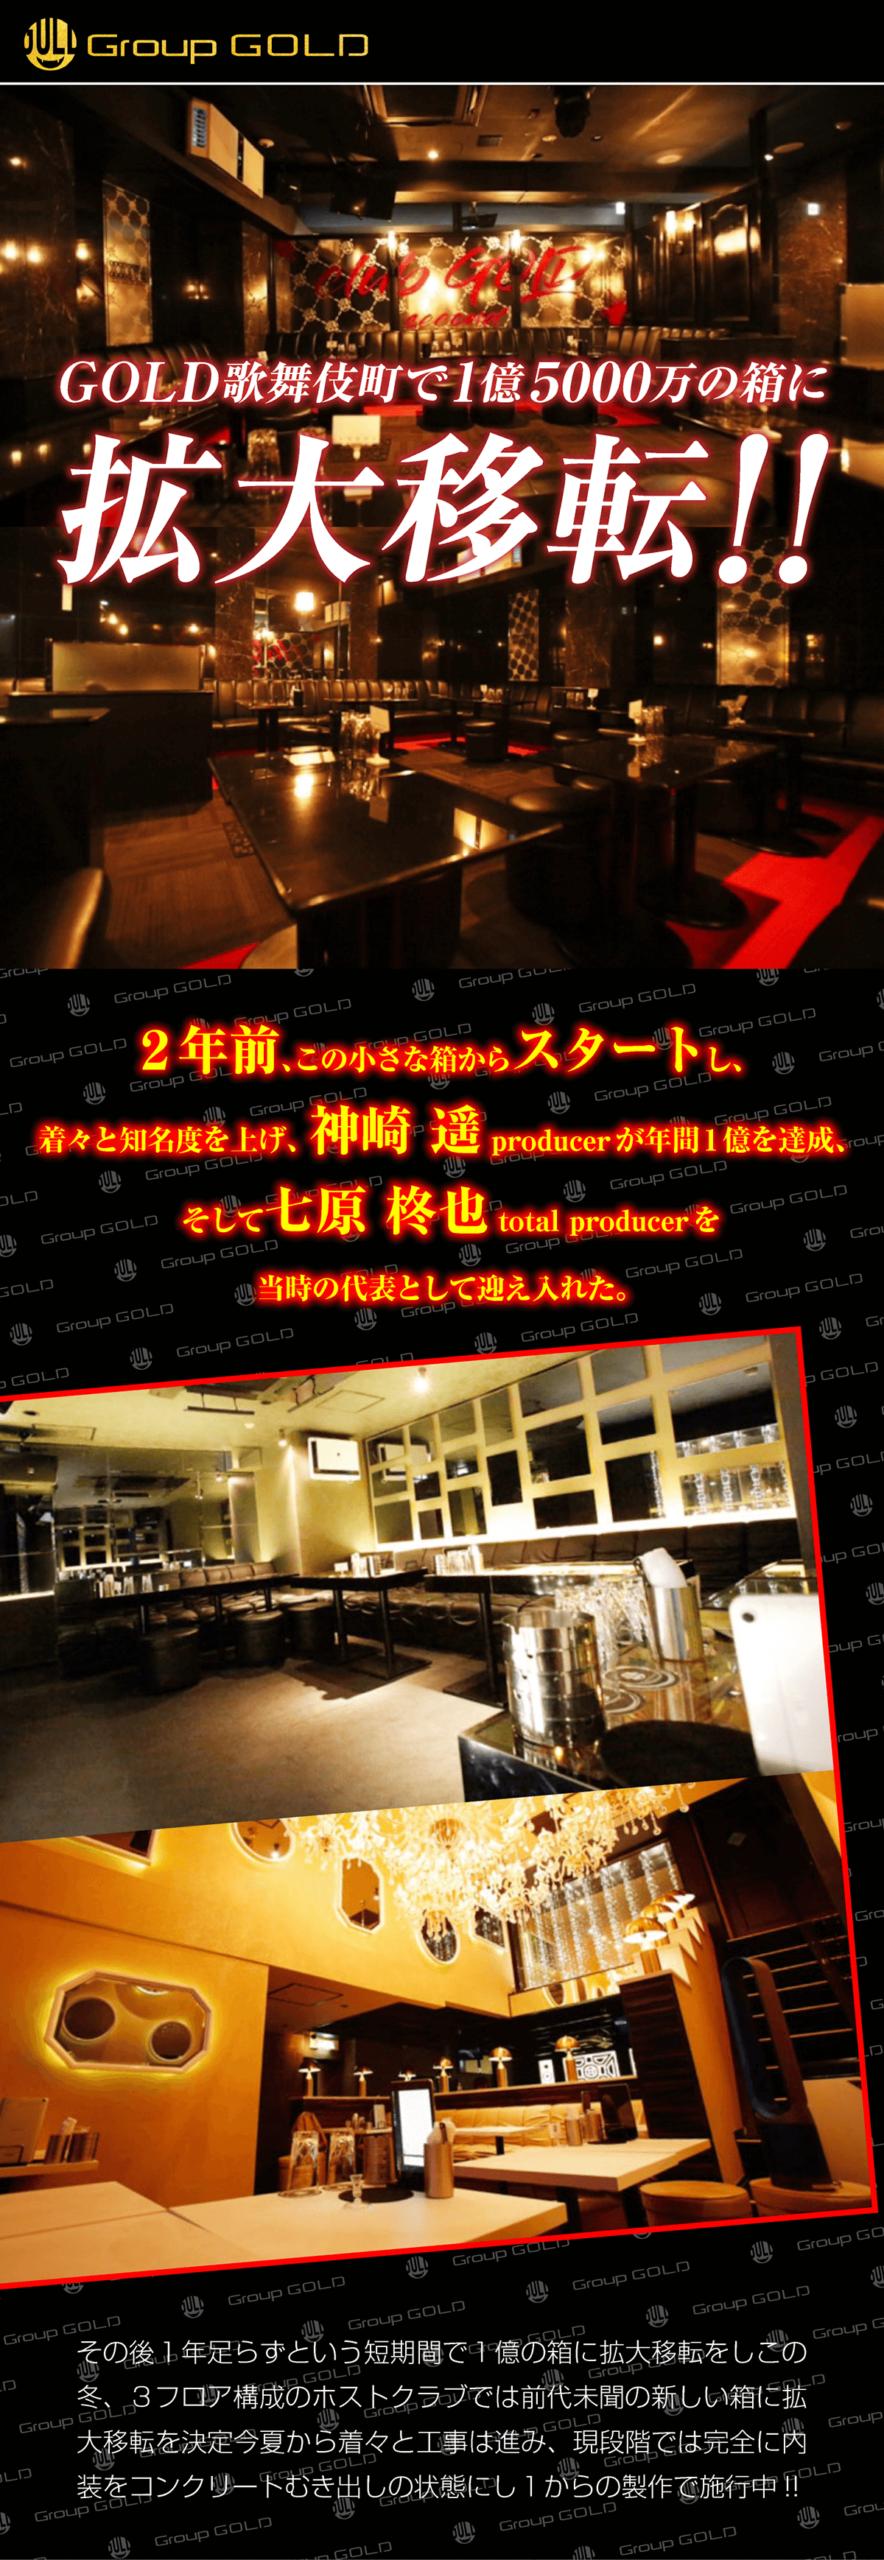 GOLD歌舞伎町で2億の箱に拡大移転!!